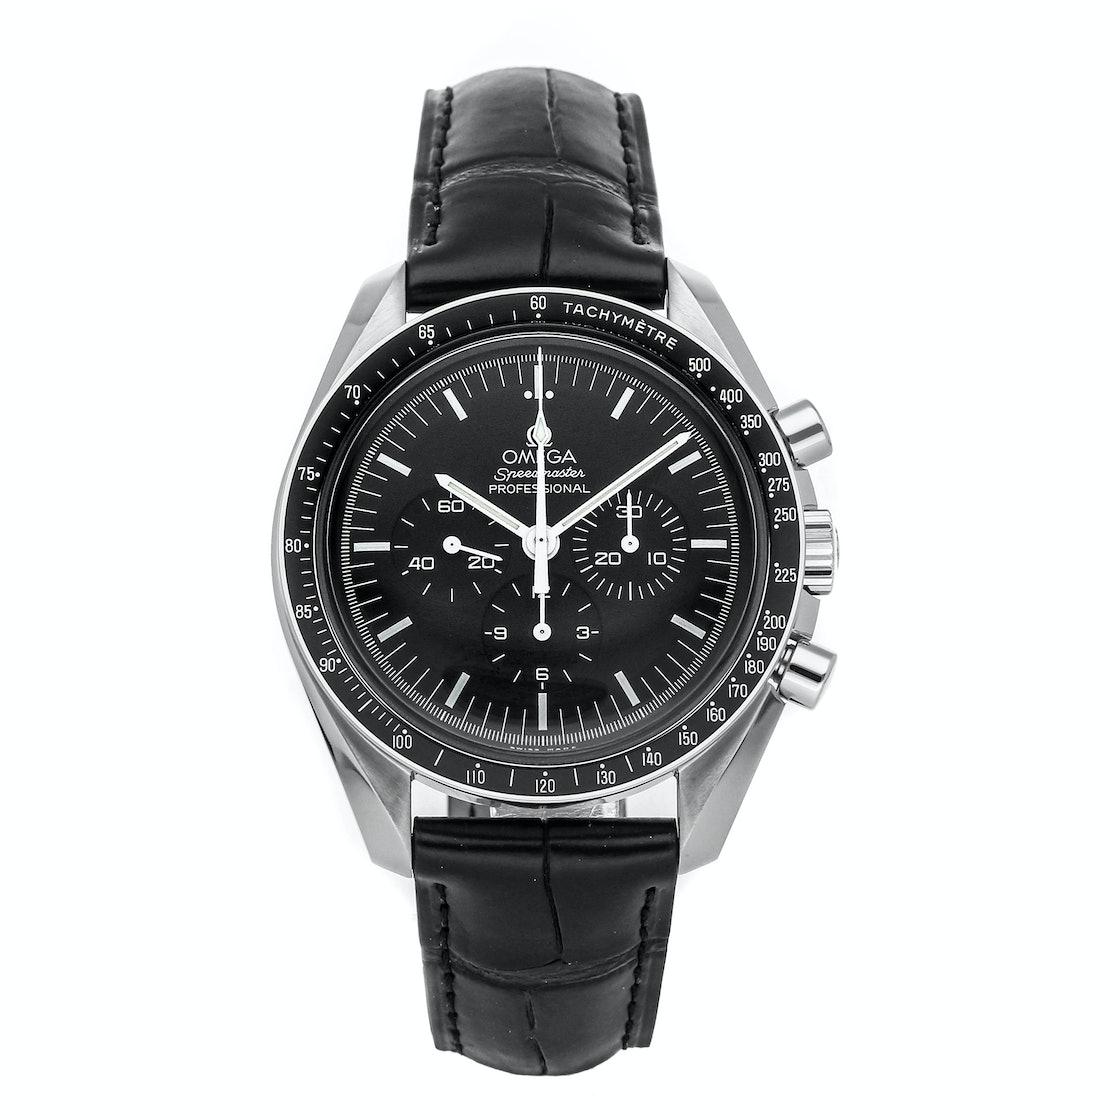 Omega Speedmaster Moonwatch Professional Chronograph 311.33.42.30.01.001